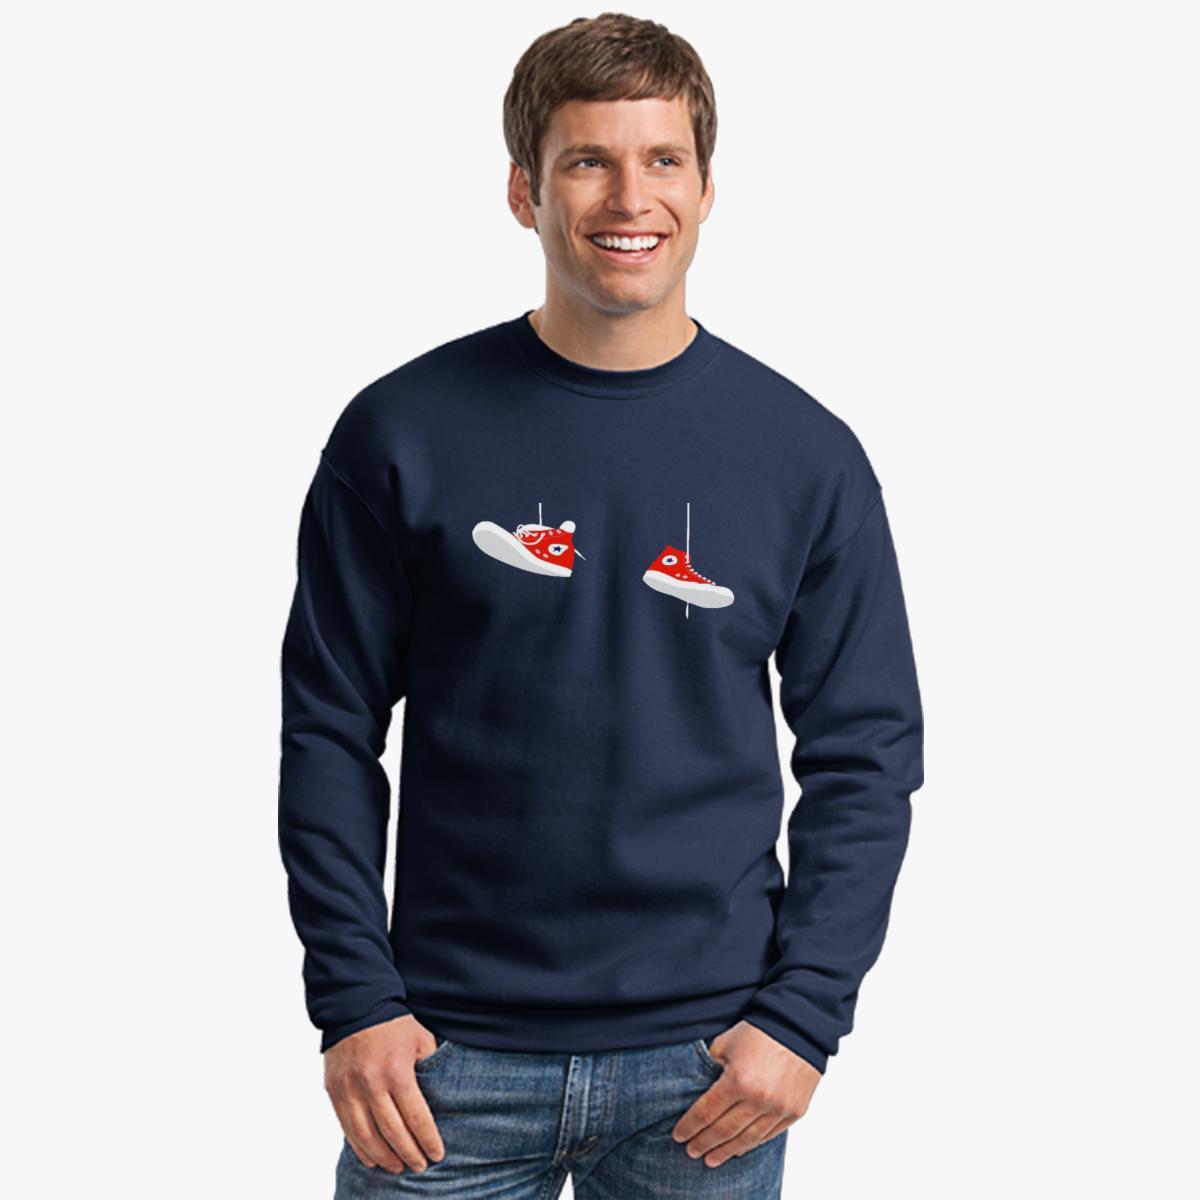 converse crew sweatshirt